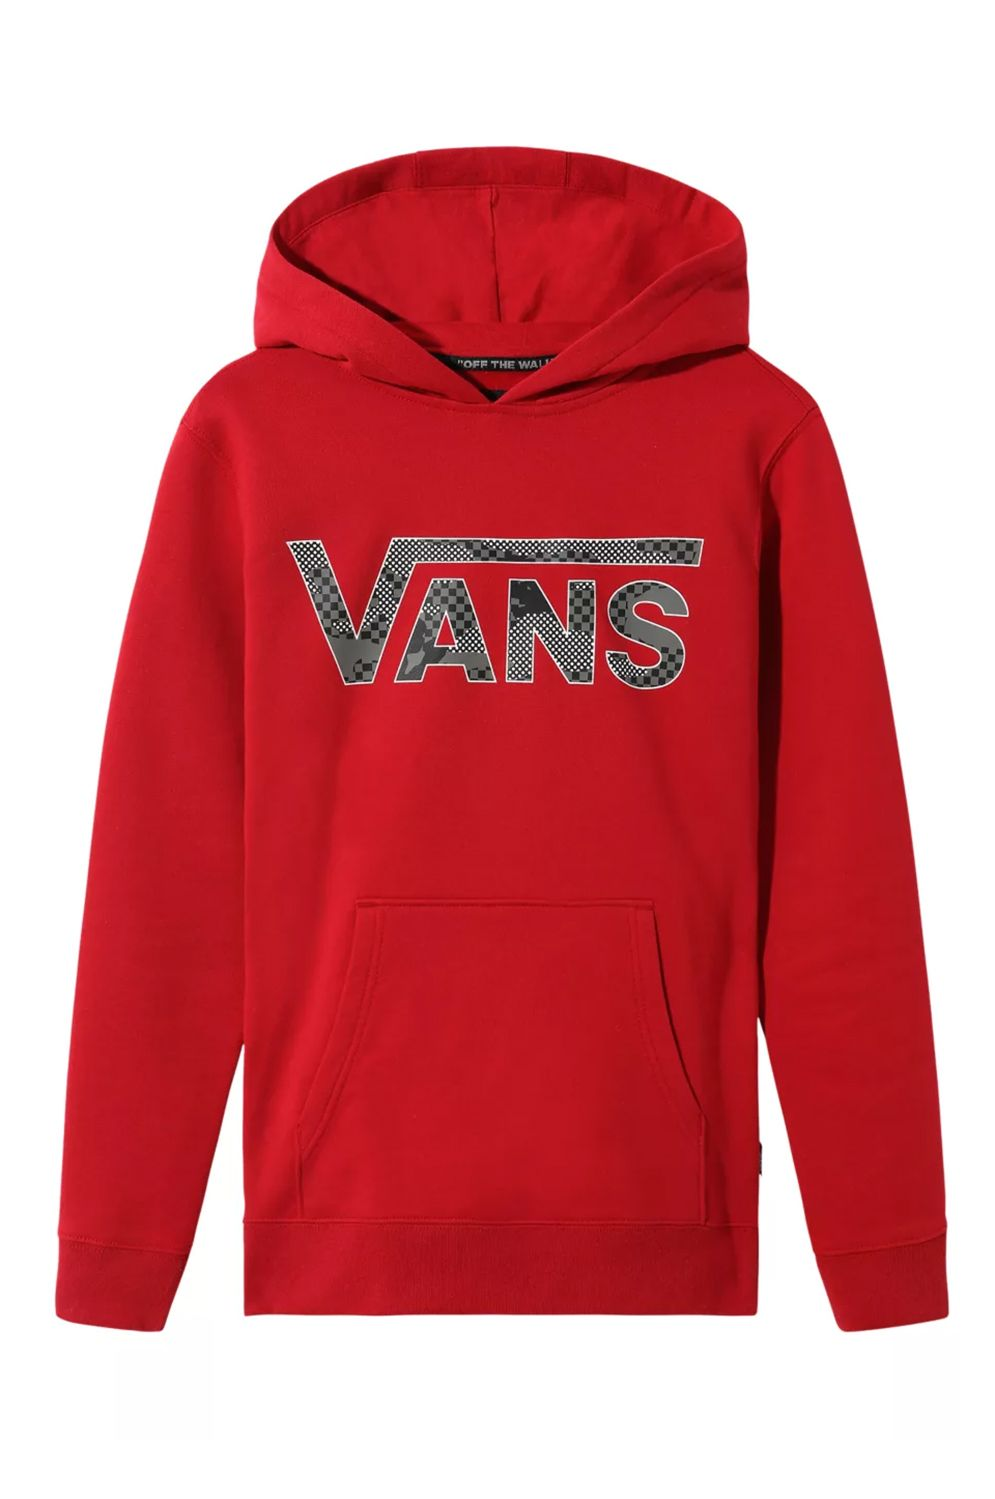 Vans Sweat Hood VANS CLASSIC PO II BOYS Chili Pepper-Pattern Camo